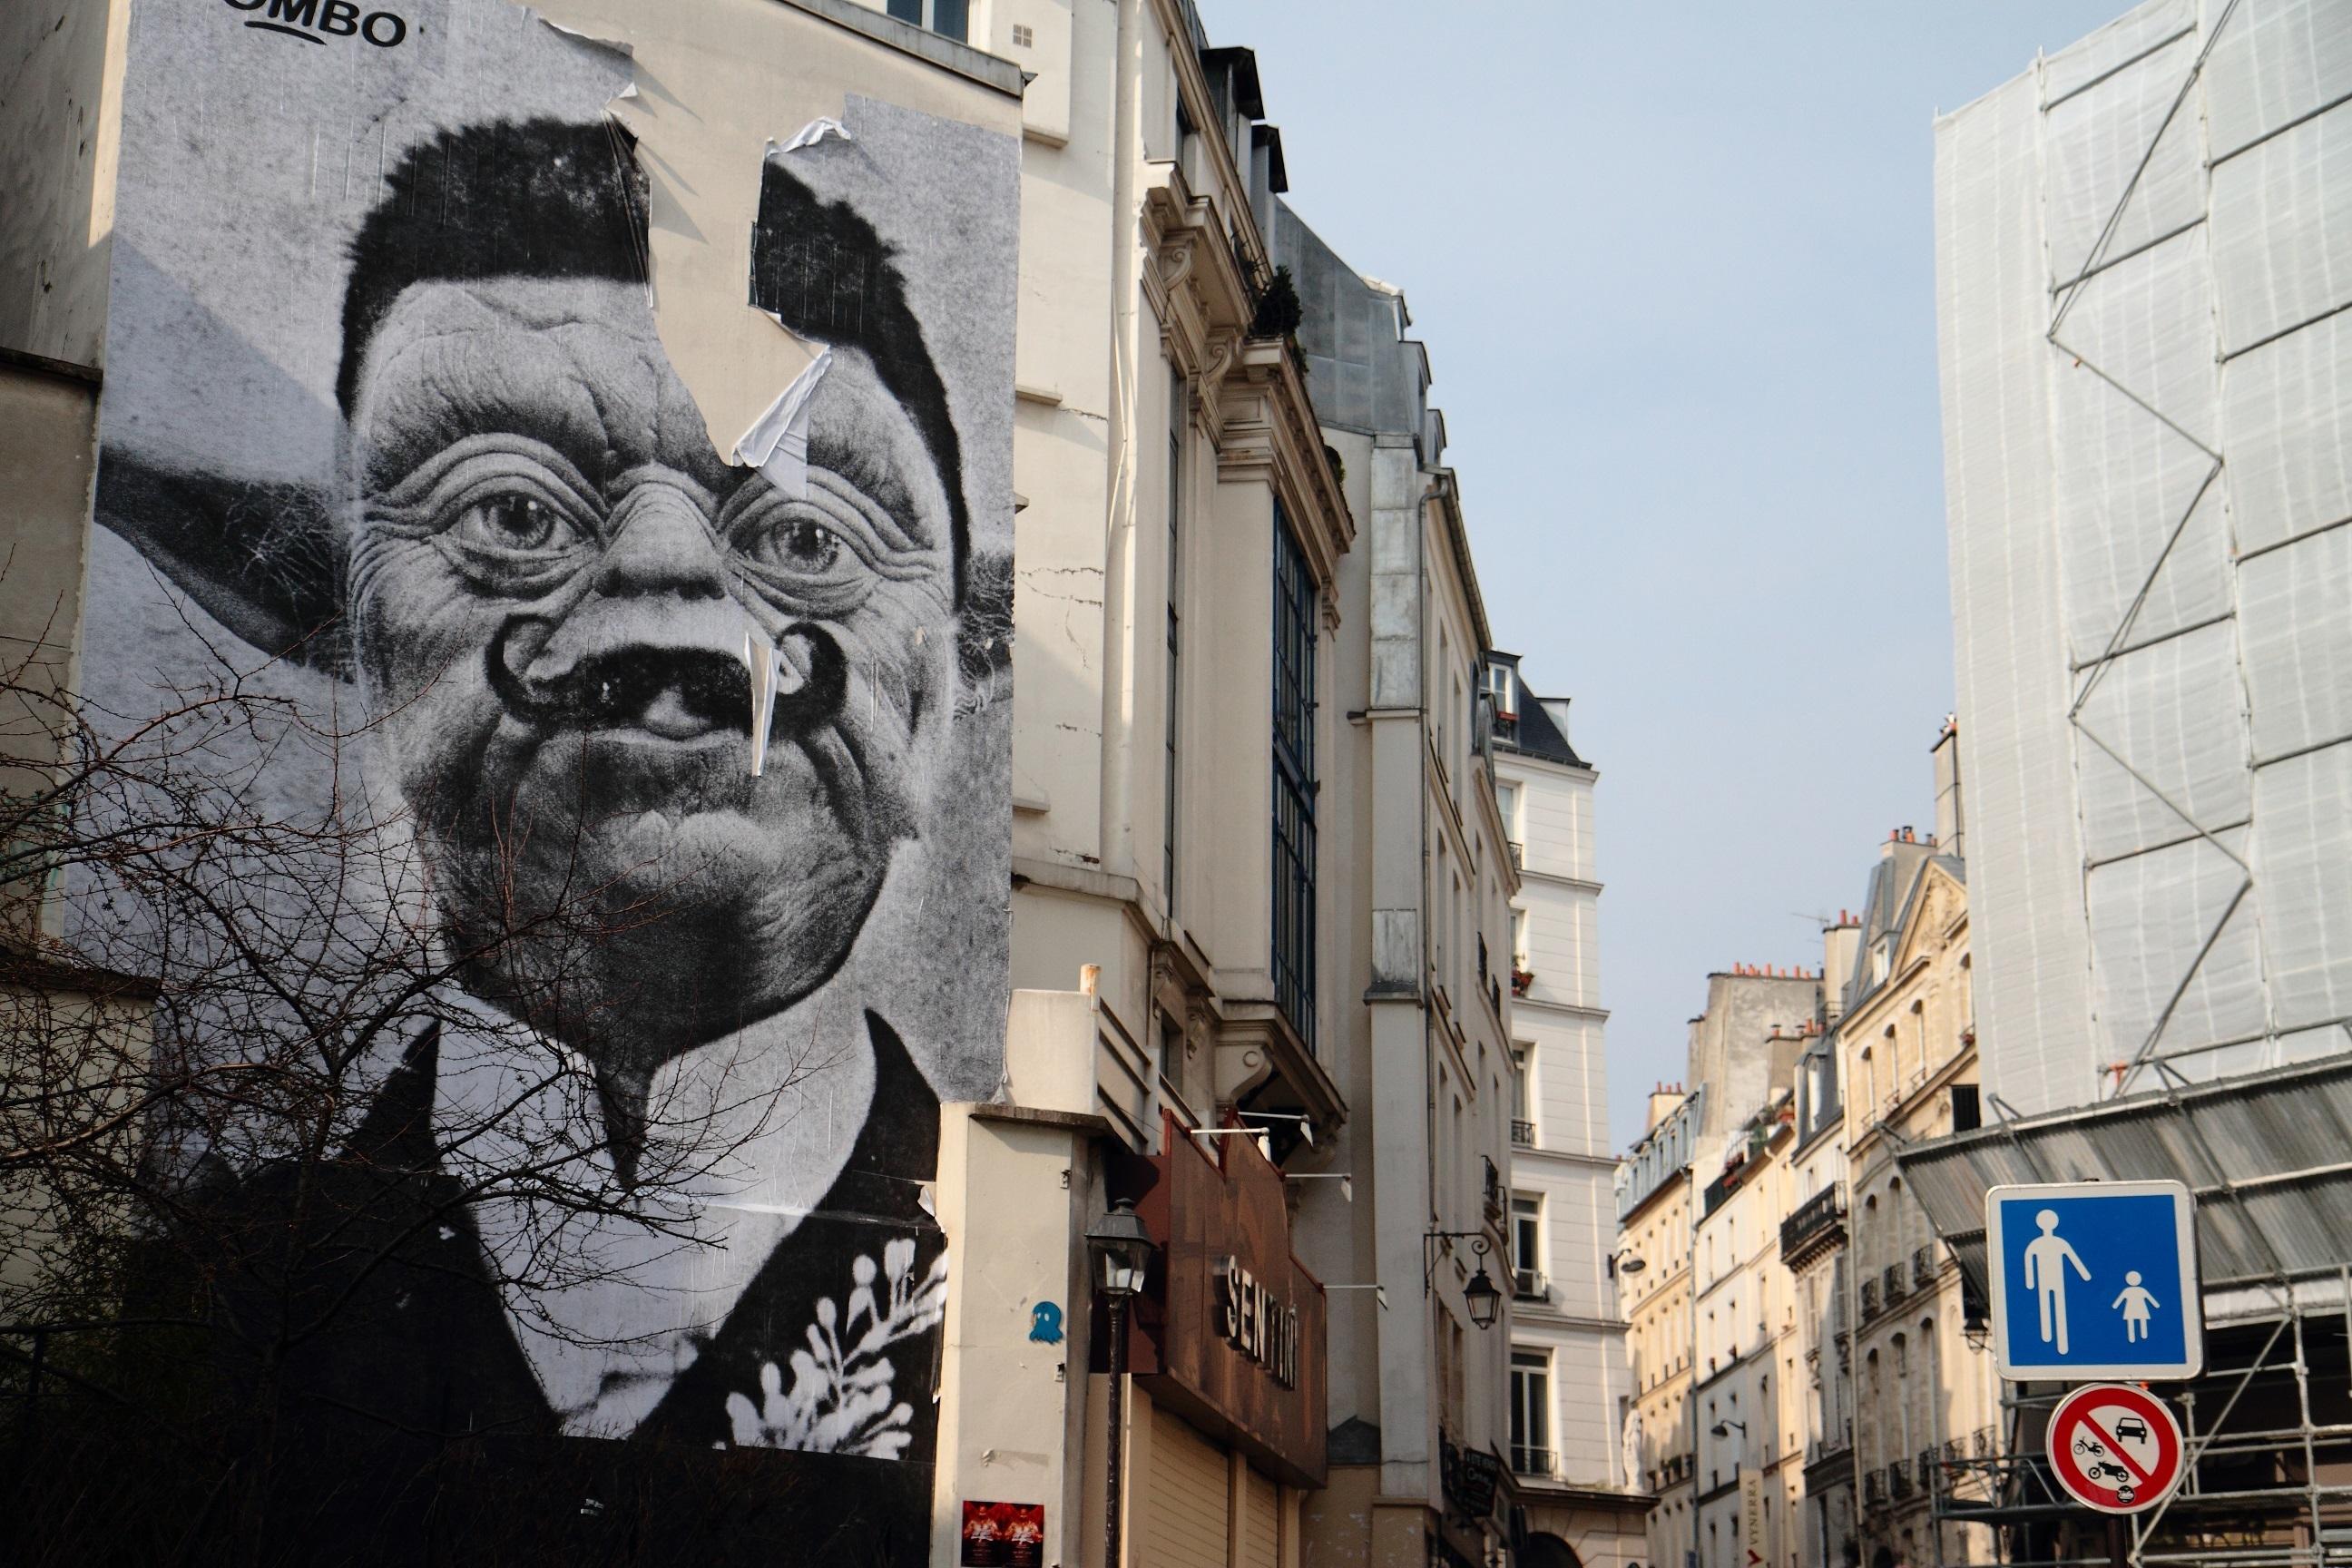 Street Art Yoda